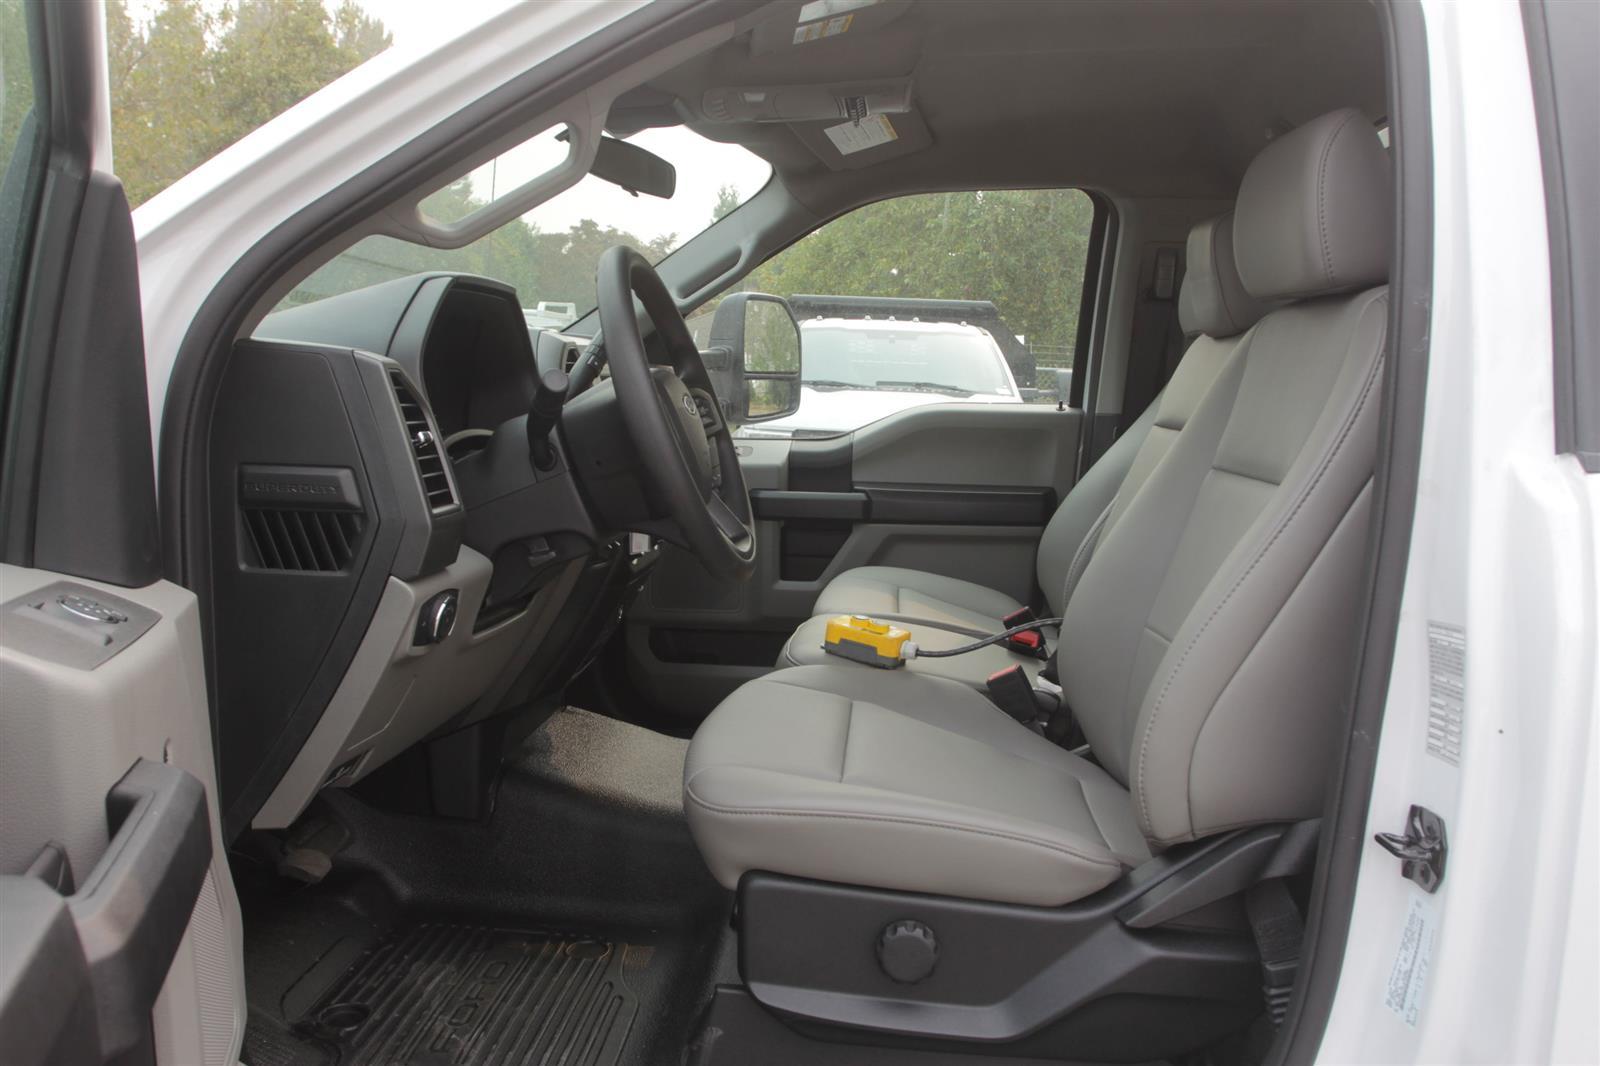 2020 Ford F-550 Regular Cab DRW 4x4, Independent Dealer Accessories Platform Body #E9263 - photo 14